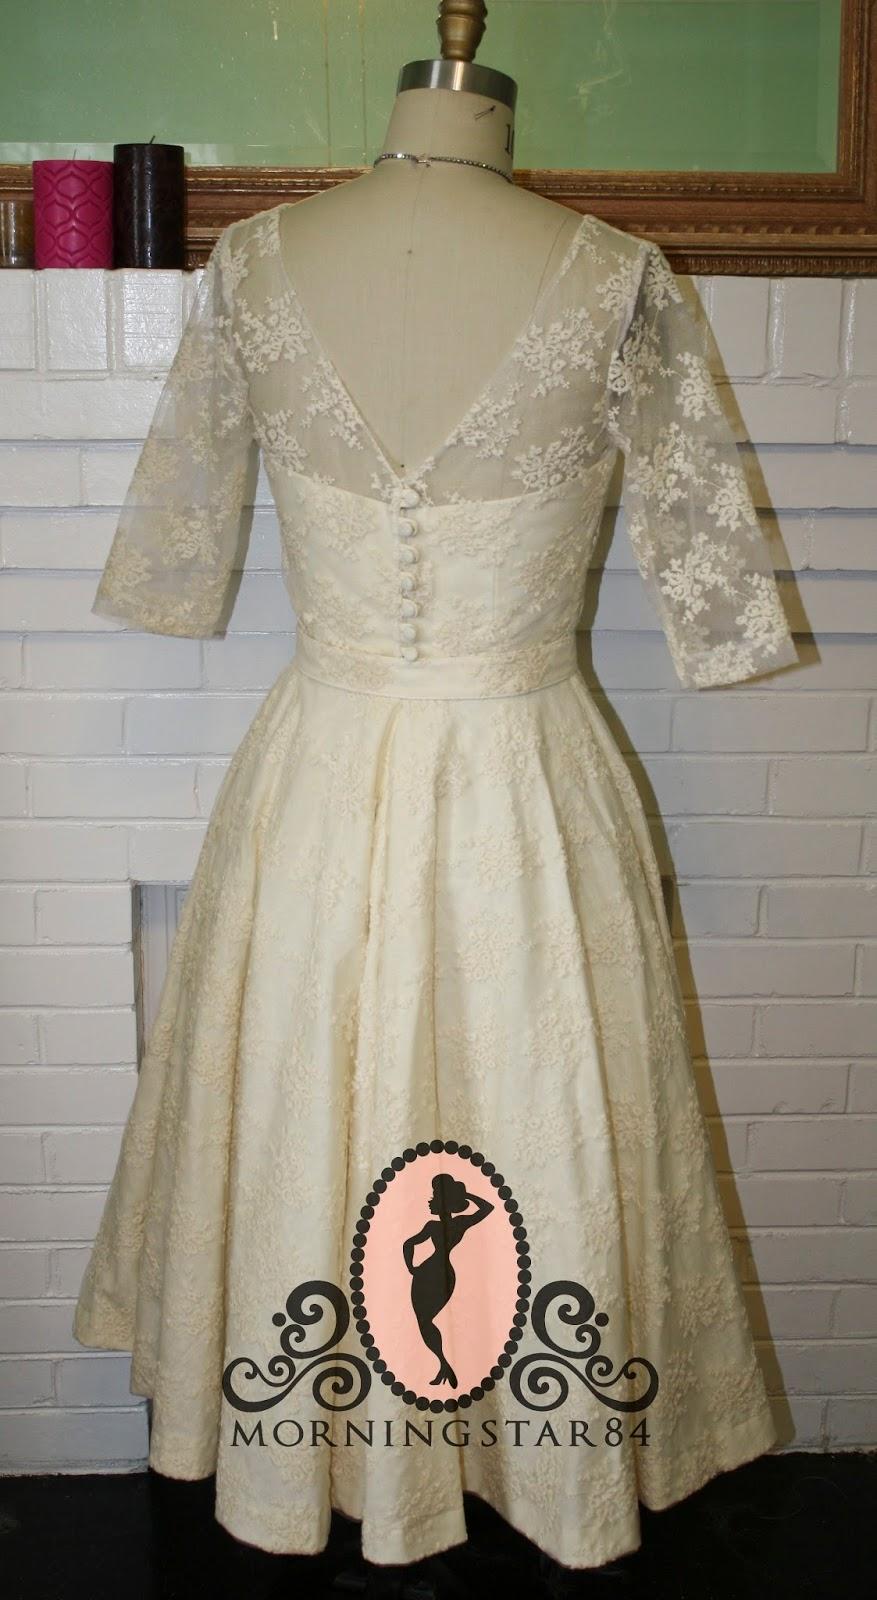 Morningstar Pinup Audrey Hepburn S Oscar Dress Variations